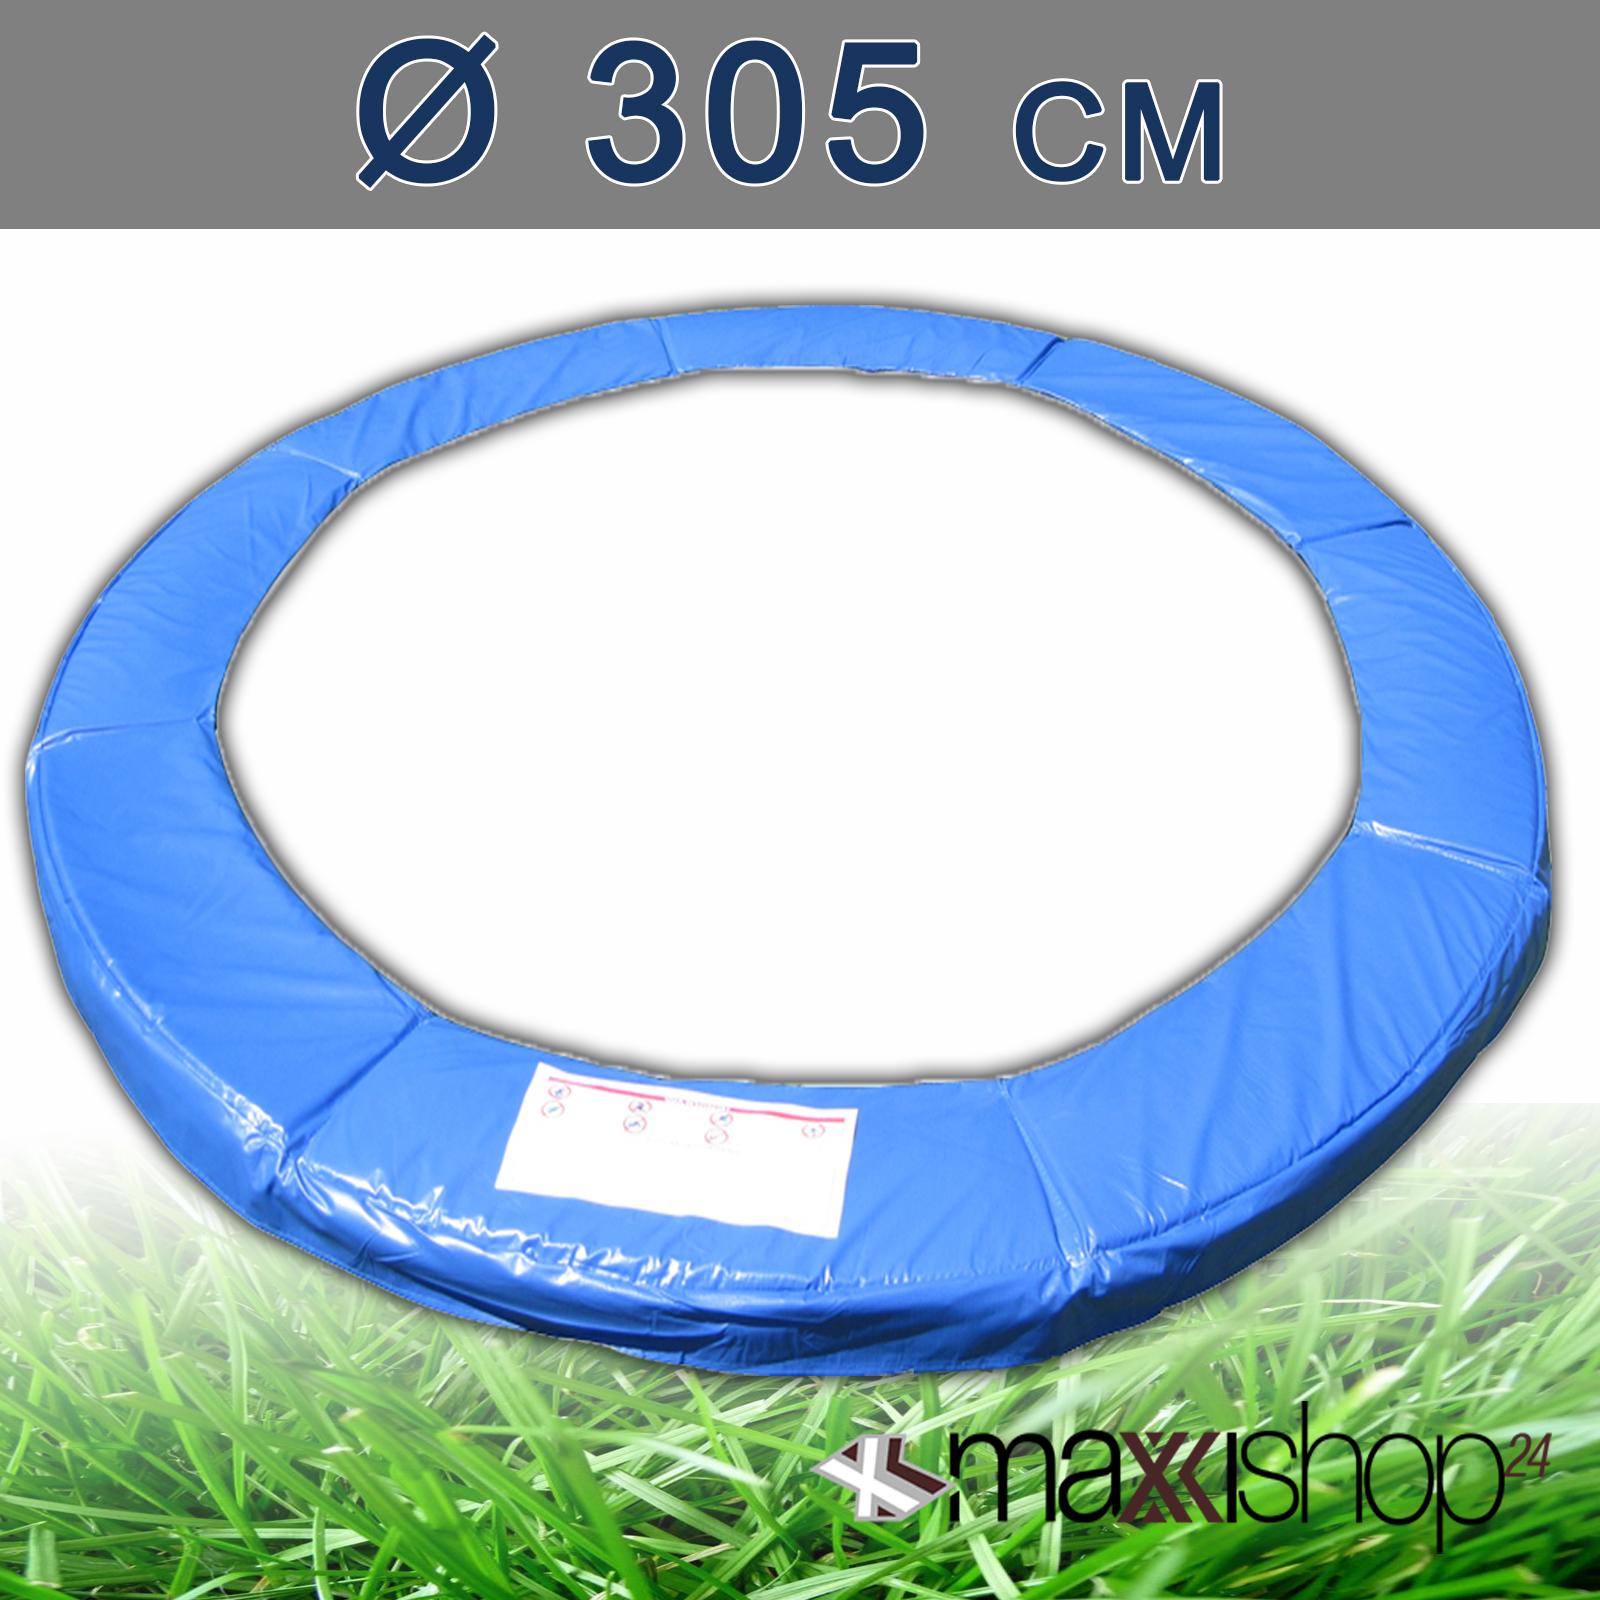 trampolin 305 366 430 cm ersatzteile netz randabdeckung. Black Bedroom Furniture Sets. Home Design Ideas